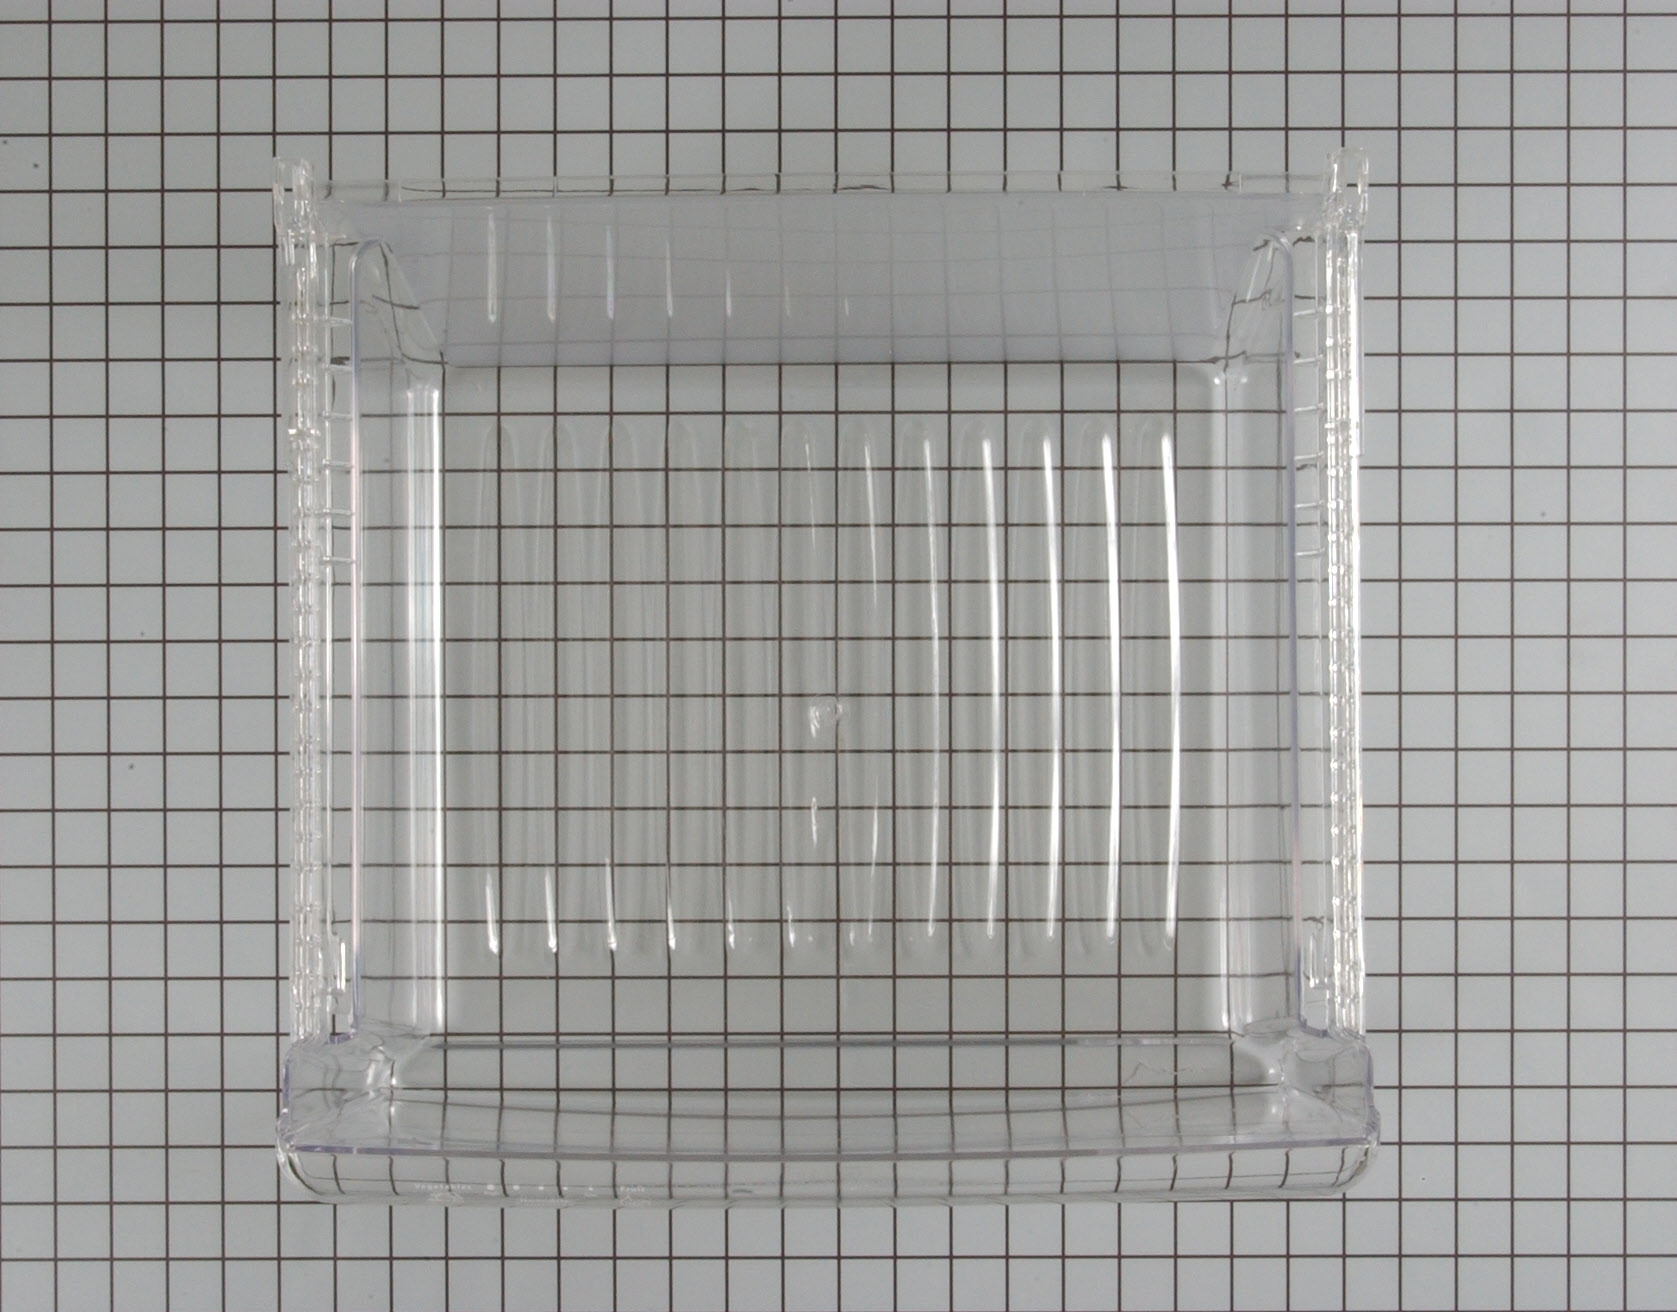 WP67005816 Crosley Refrigerator Part -Crisper Drawer